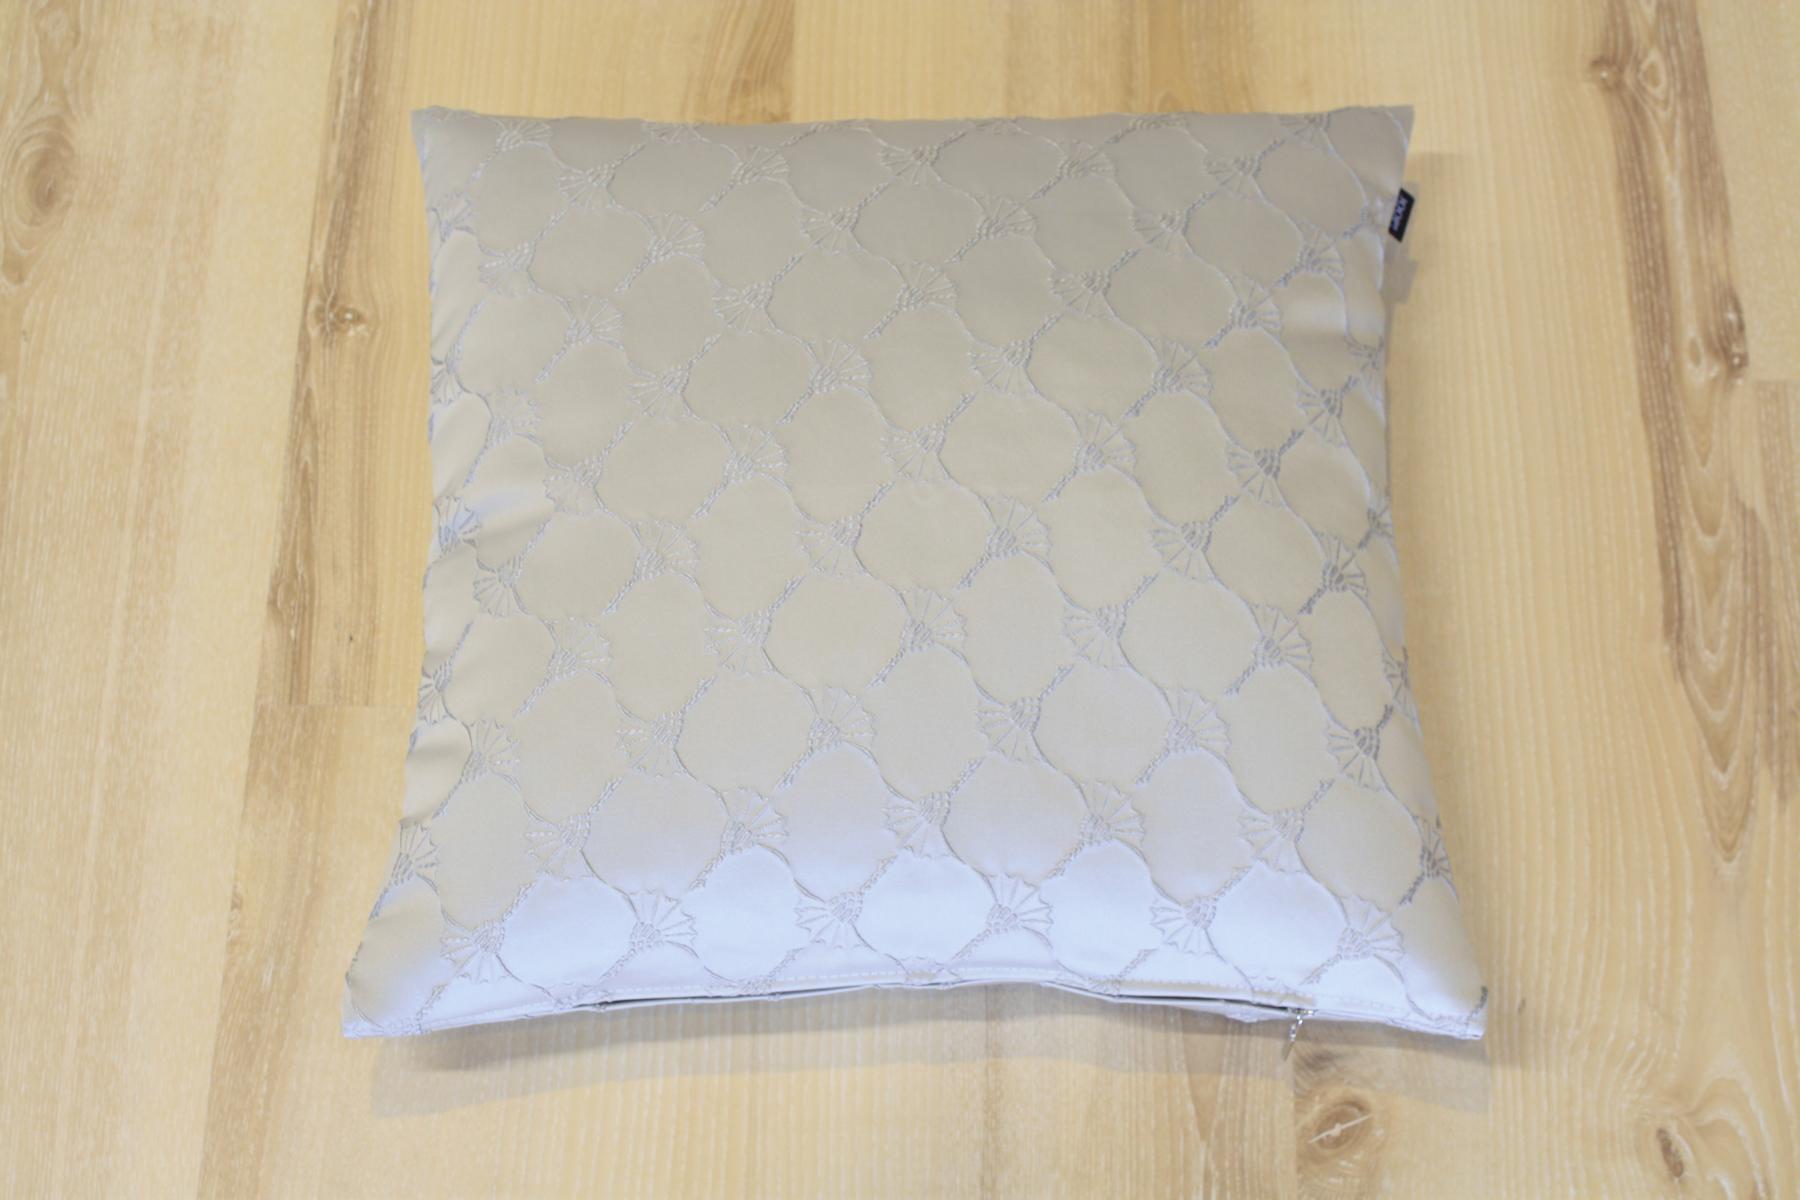 joop kissen 50x50 excellent magma kissenbezug johann x cm in grau with joop kissen 50x50 x. Black Bedroom Furniture Sets. Home Design Ideas